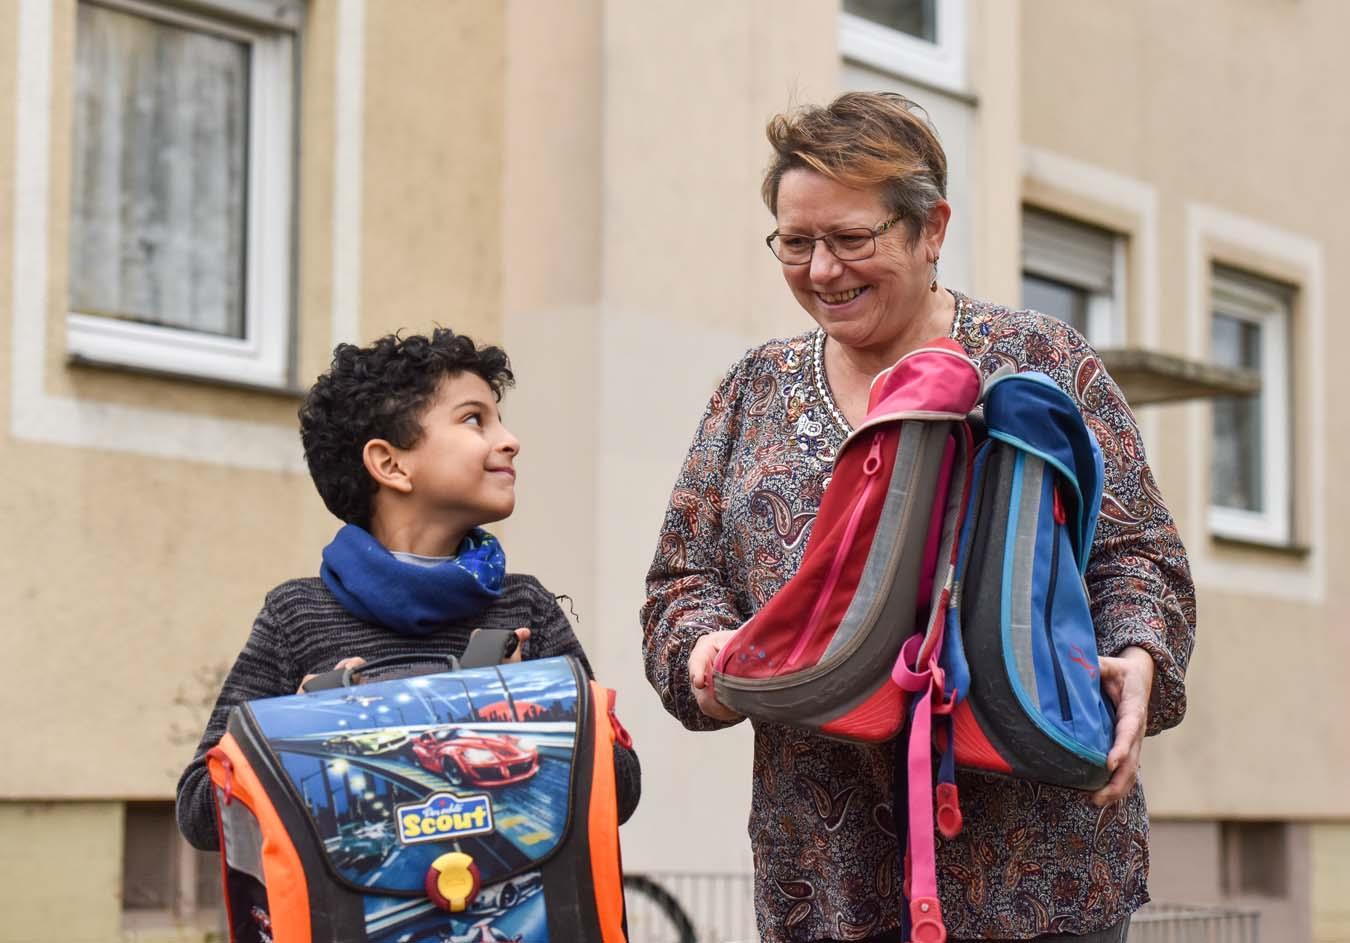 Foto: Deutscher Caritasverband/Harald Oppitz, KNA